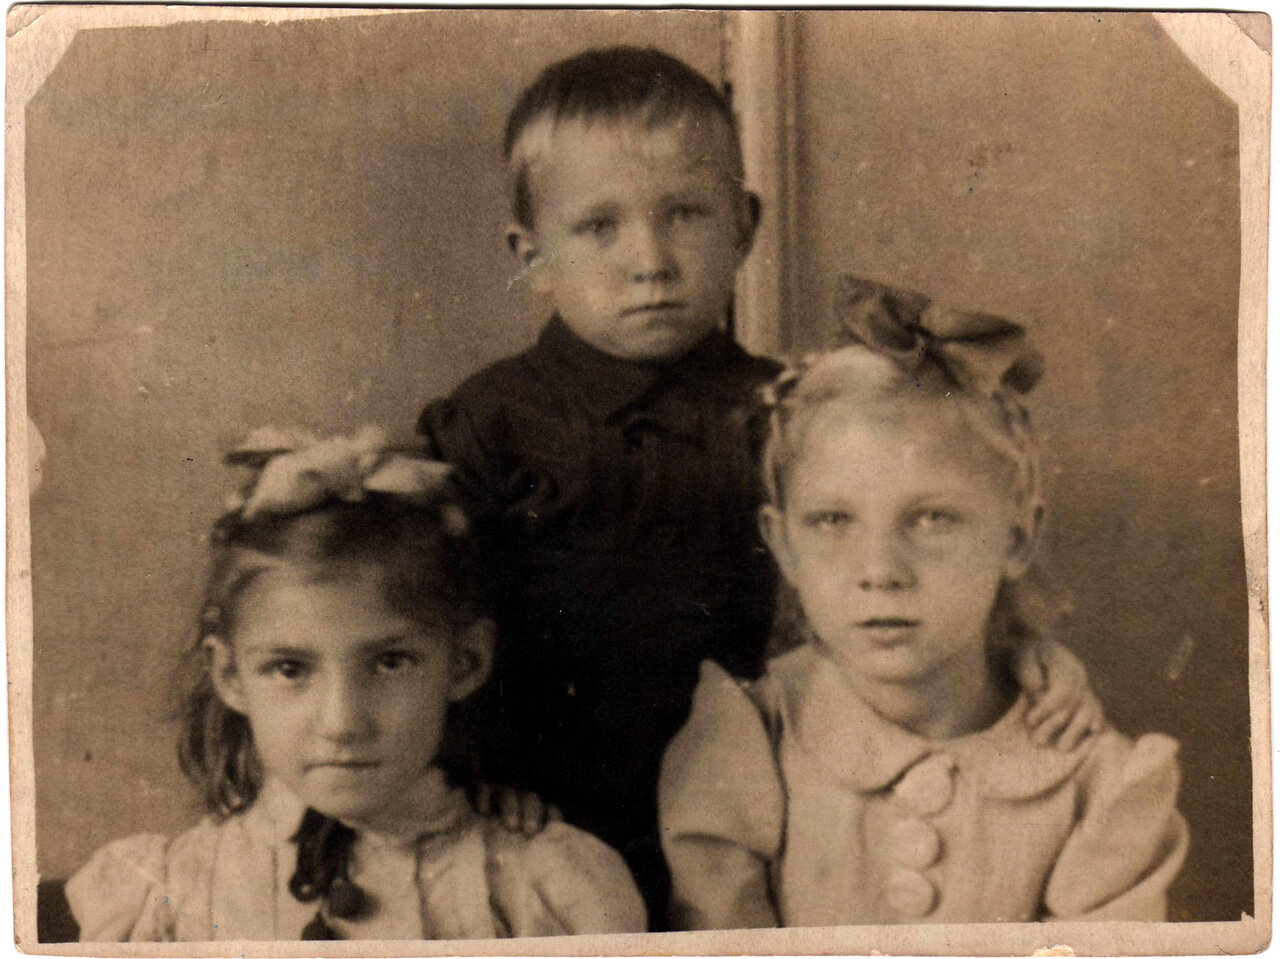 1945 .Нона, 8 лет, Светлана 7 лет и Валера 4 года